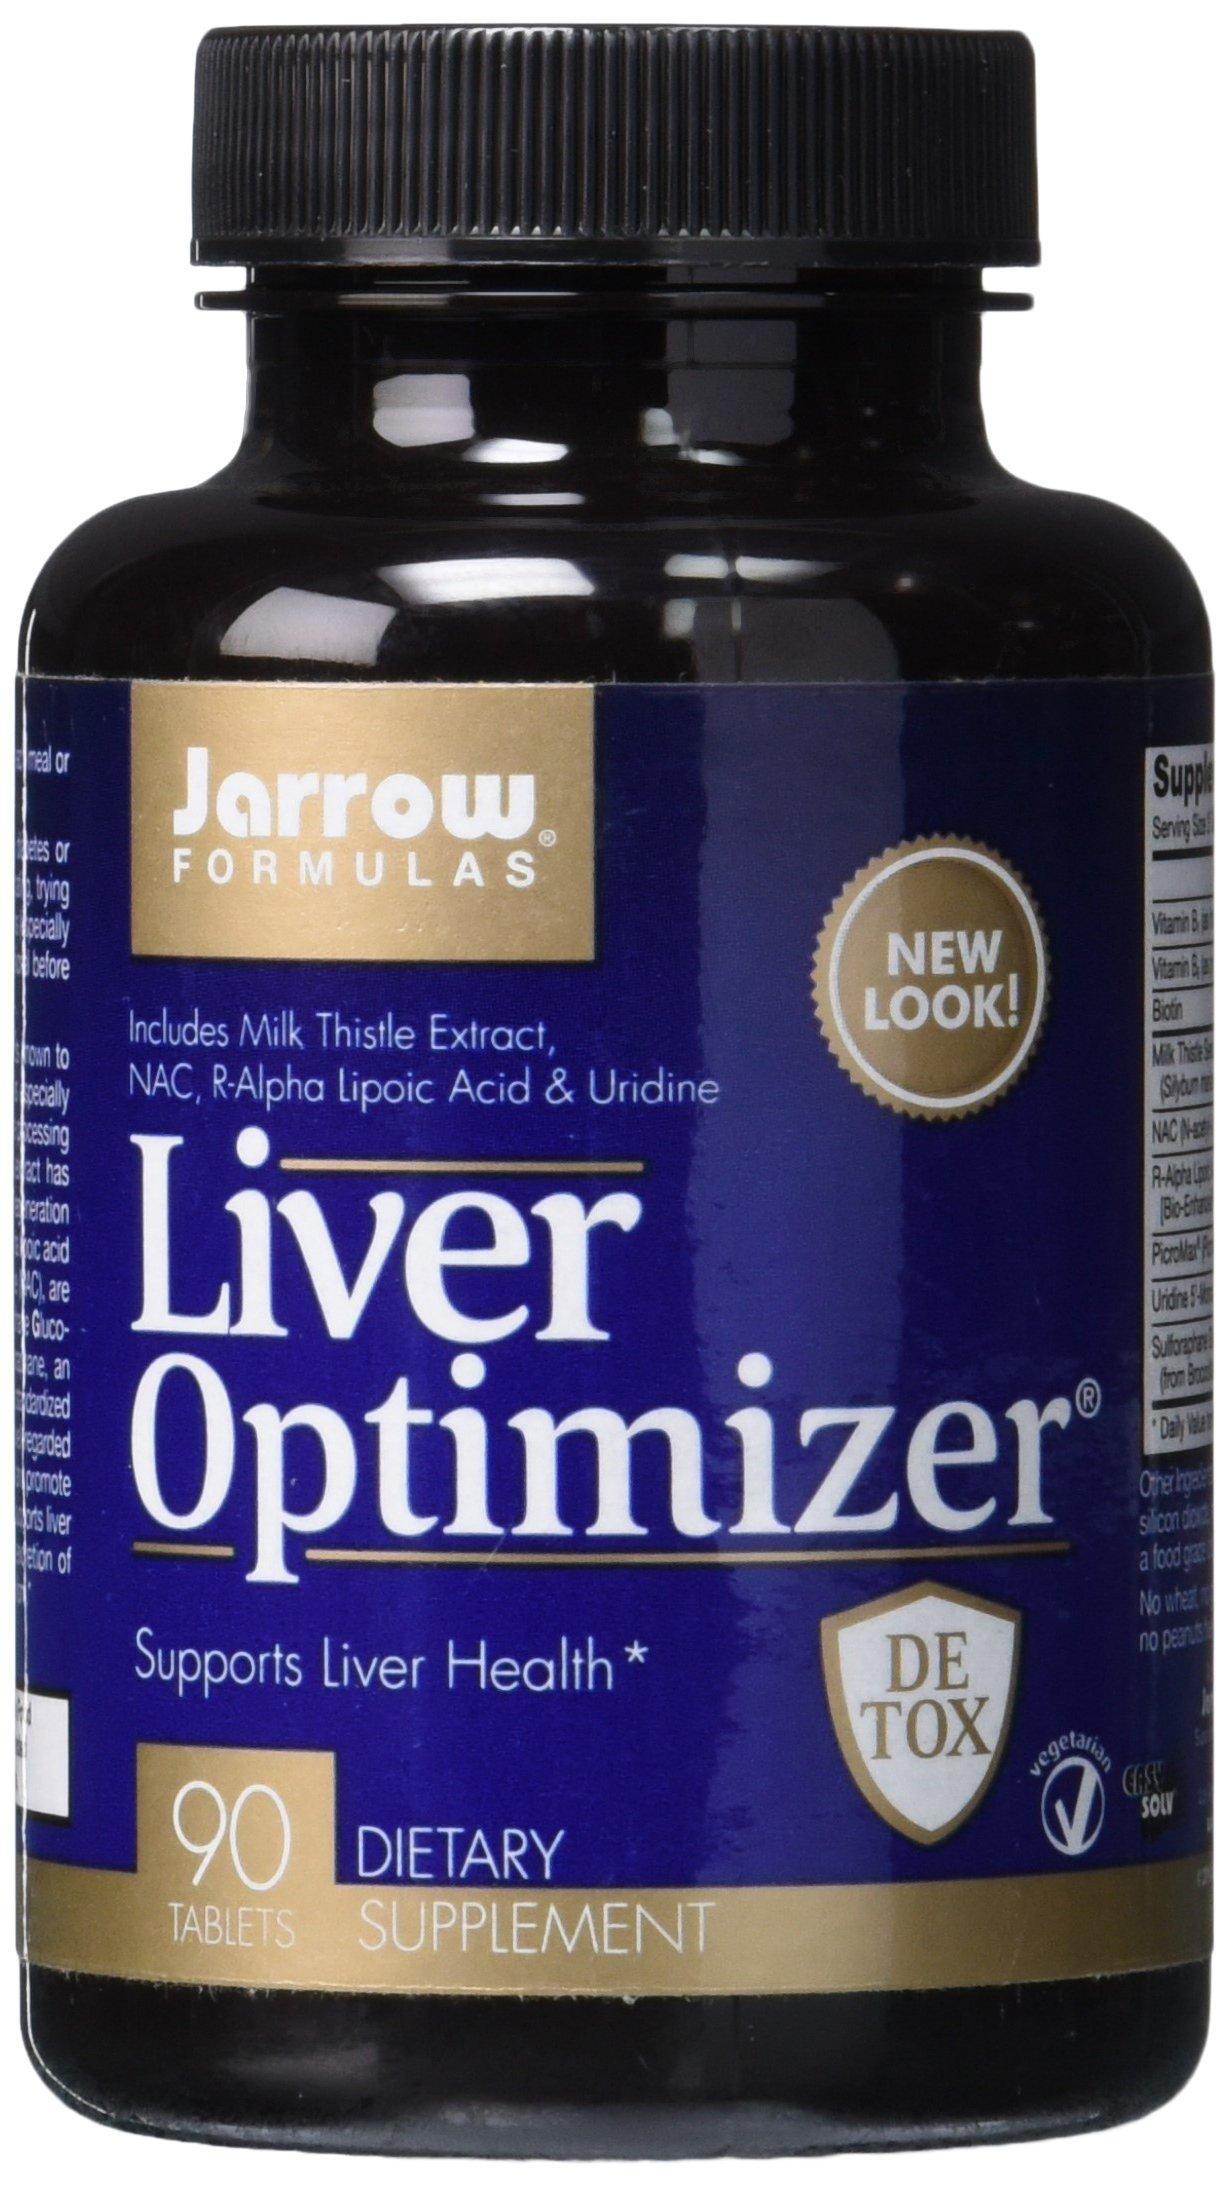 Jarrow Formulas Liver Optimizer, Supports Liver Health, 90 Easy-Solv Tabs